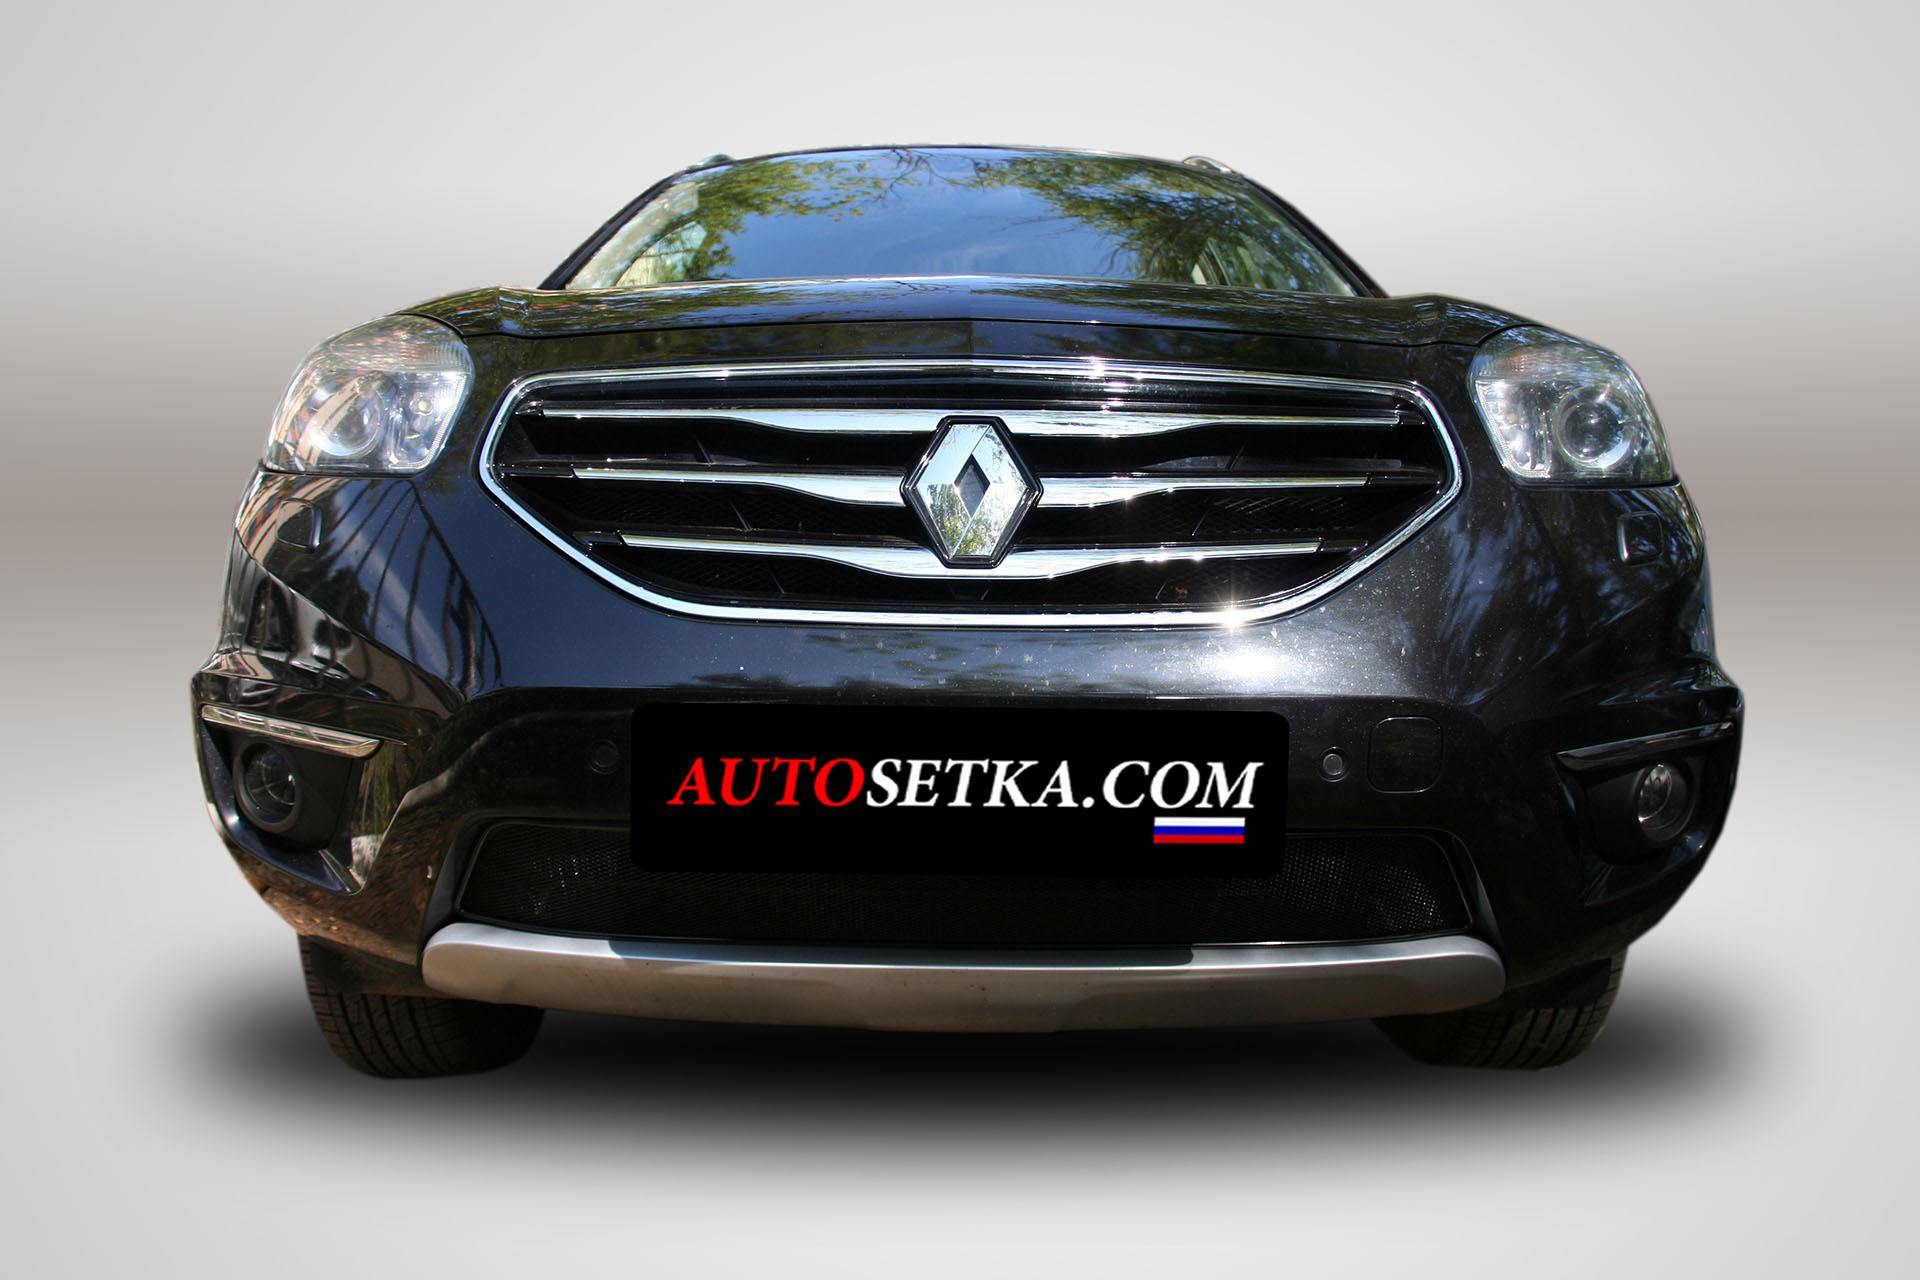 Renault Koleos (2013-)